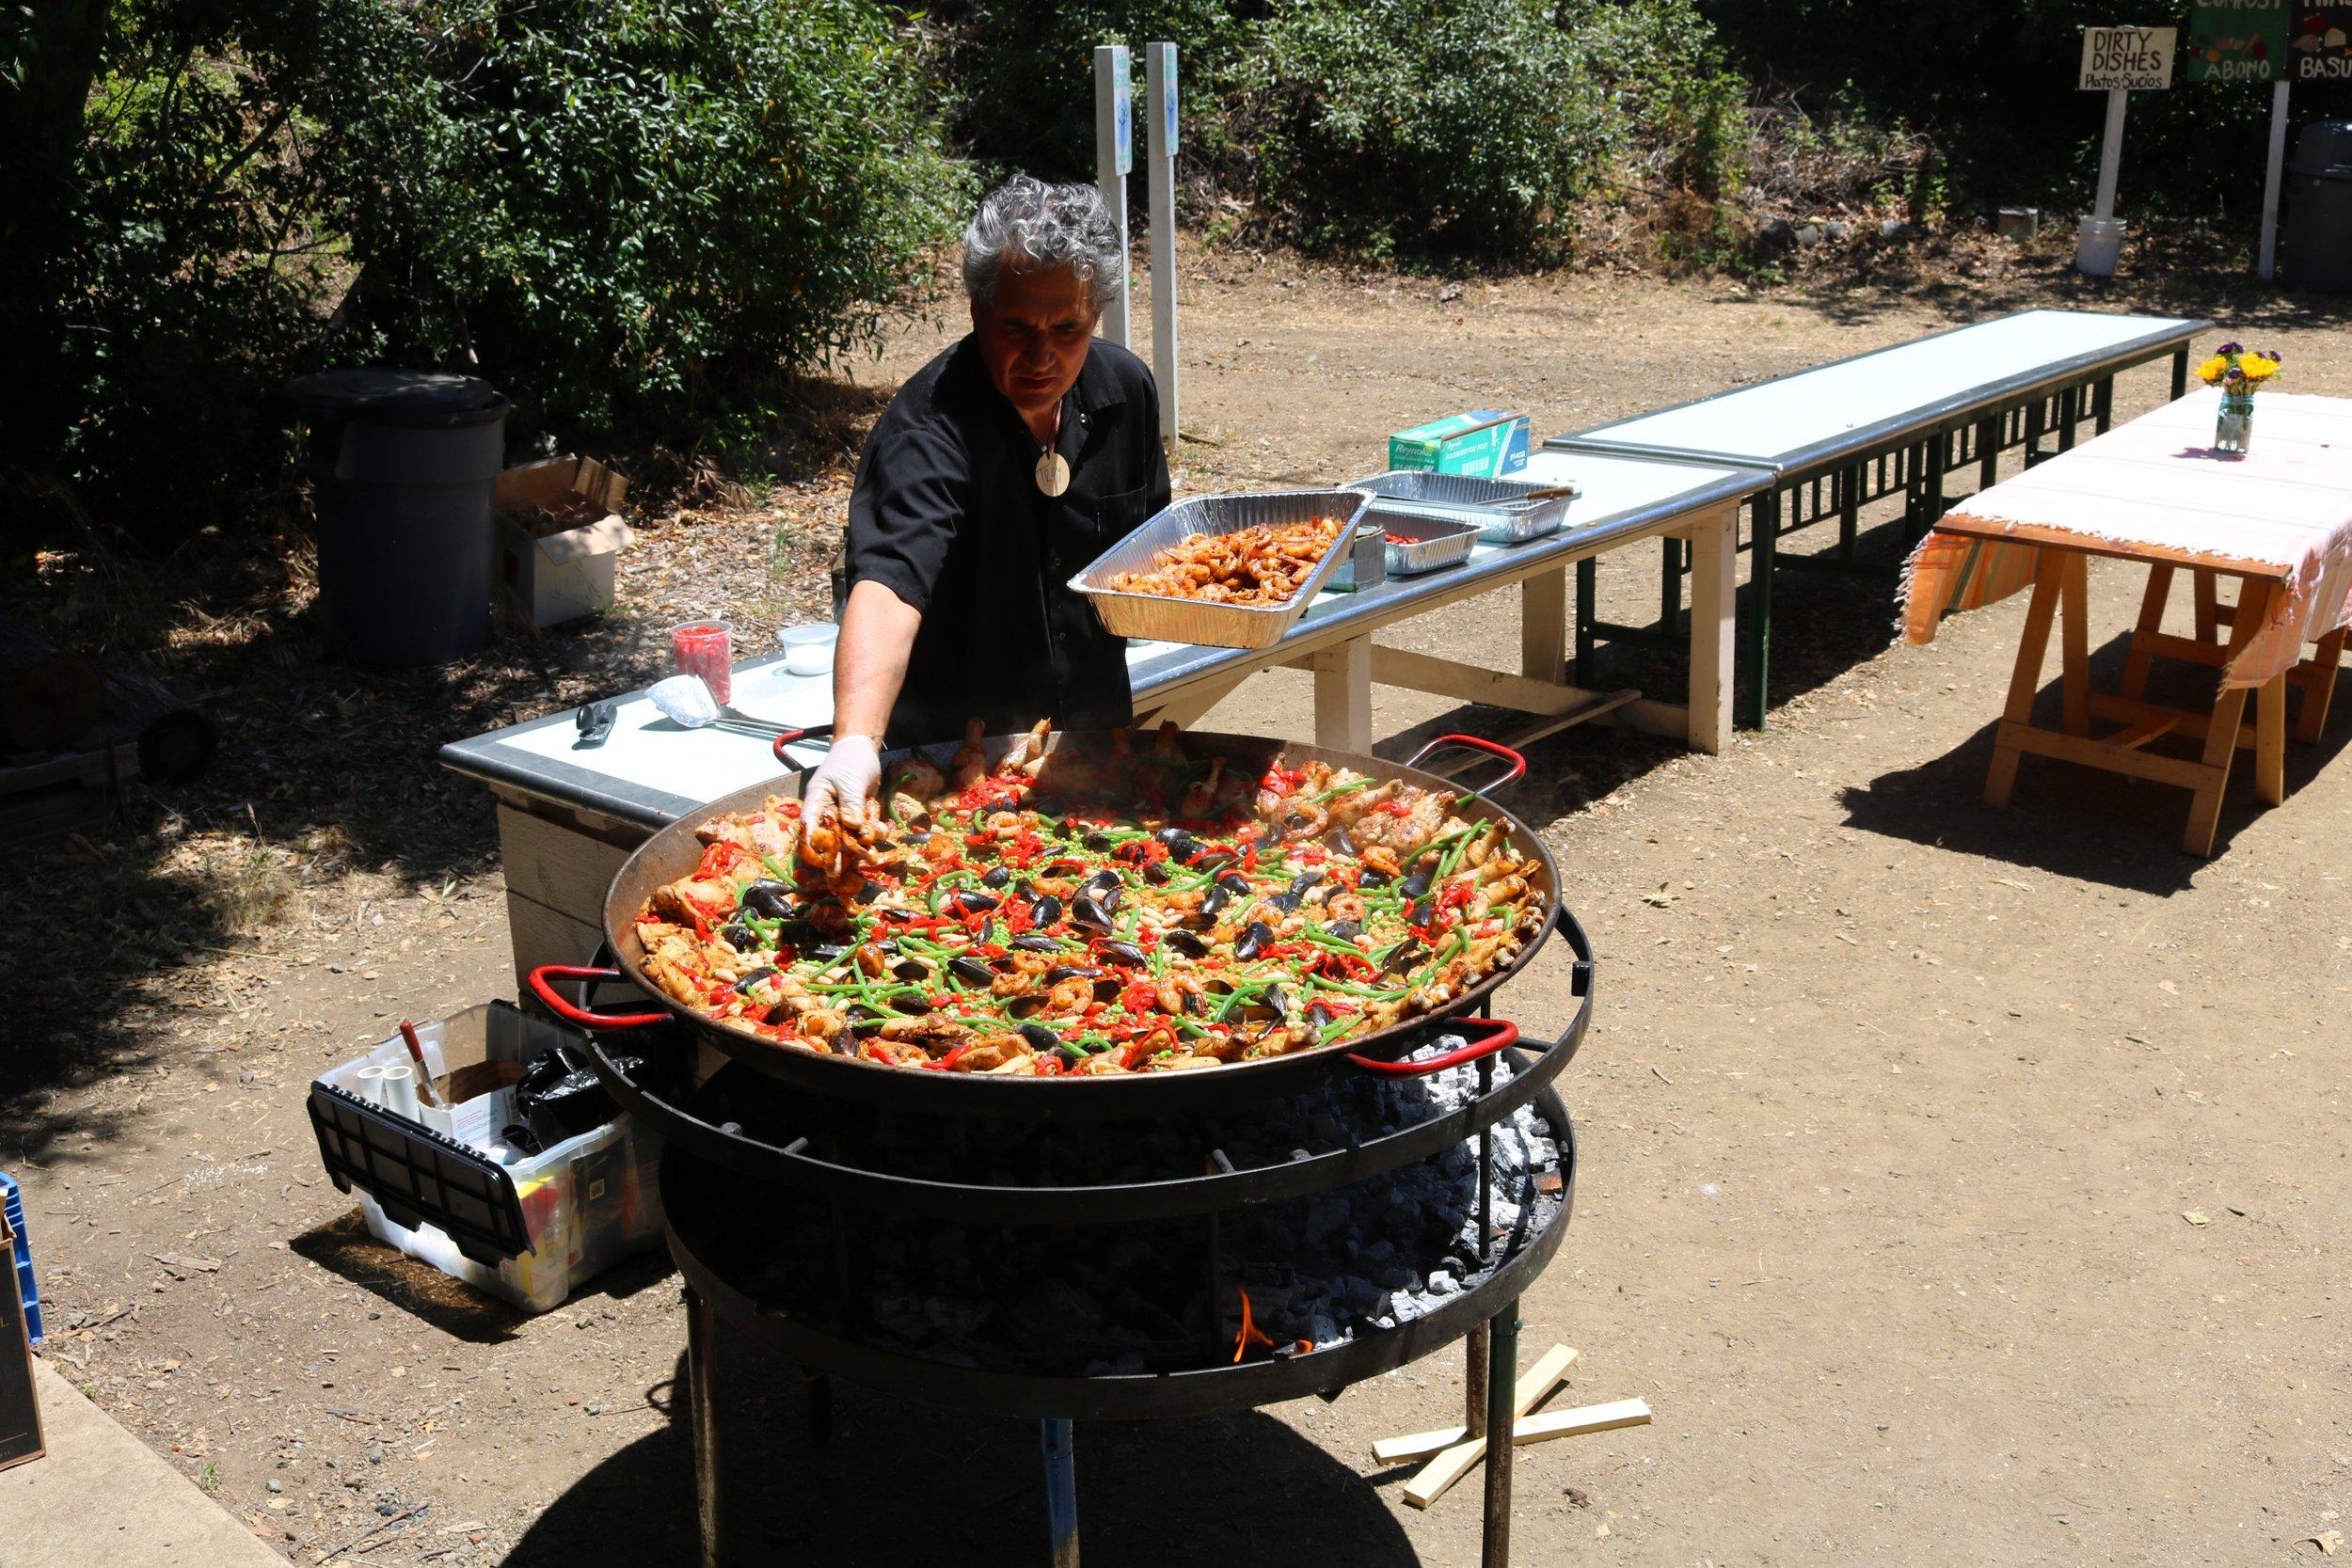 bomba-paella-catering-san-luis-obispo.JPG